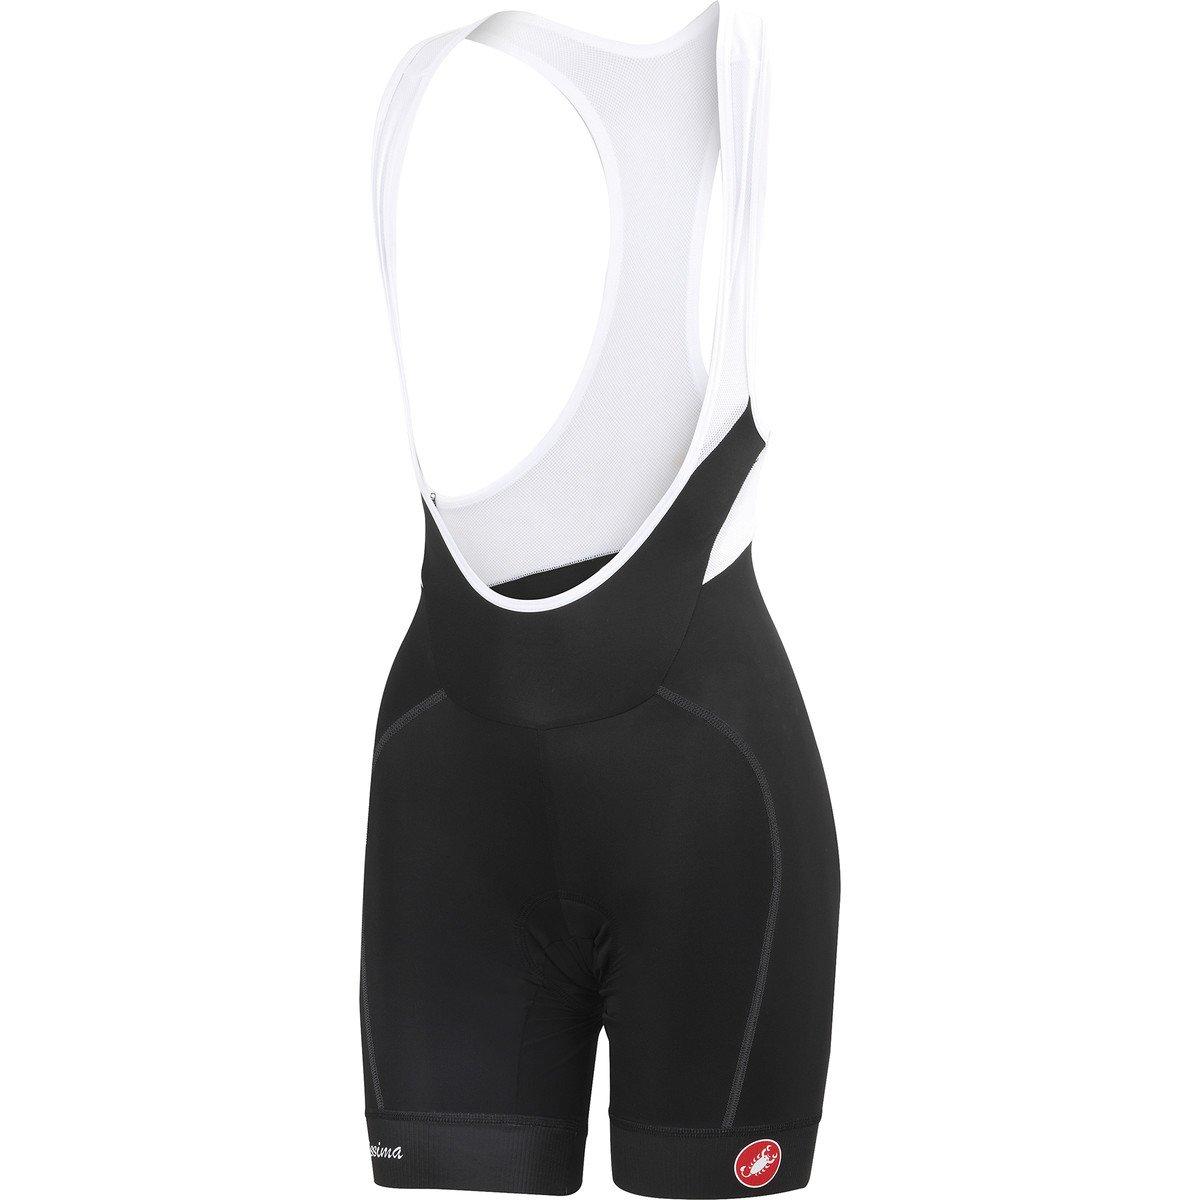 Castelli Velocissima Bib Shorts - Women's Black, S